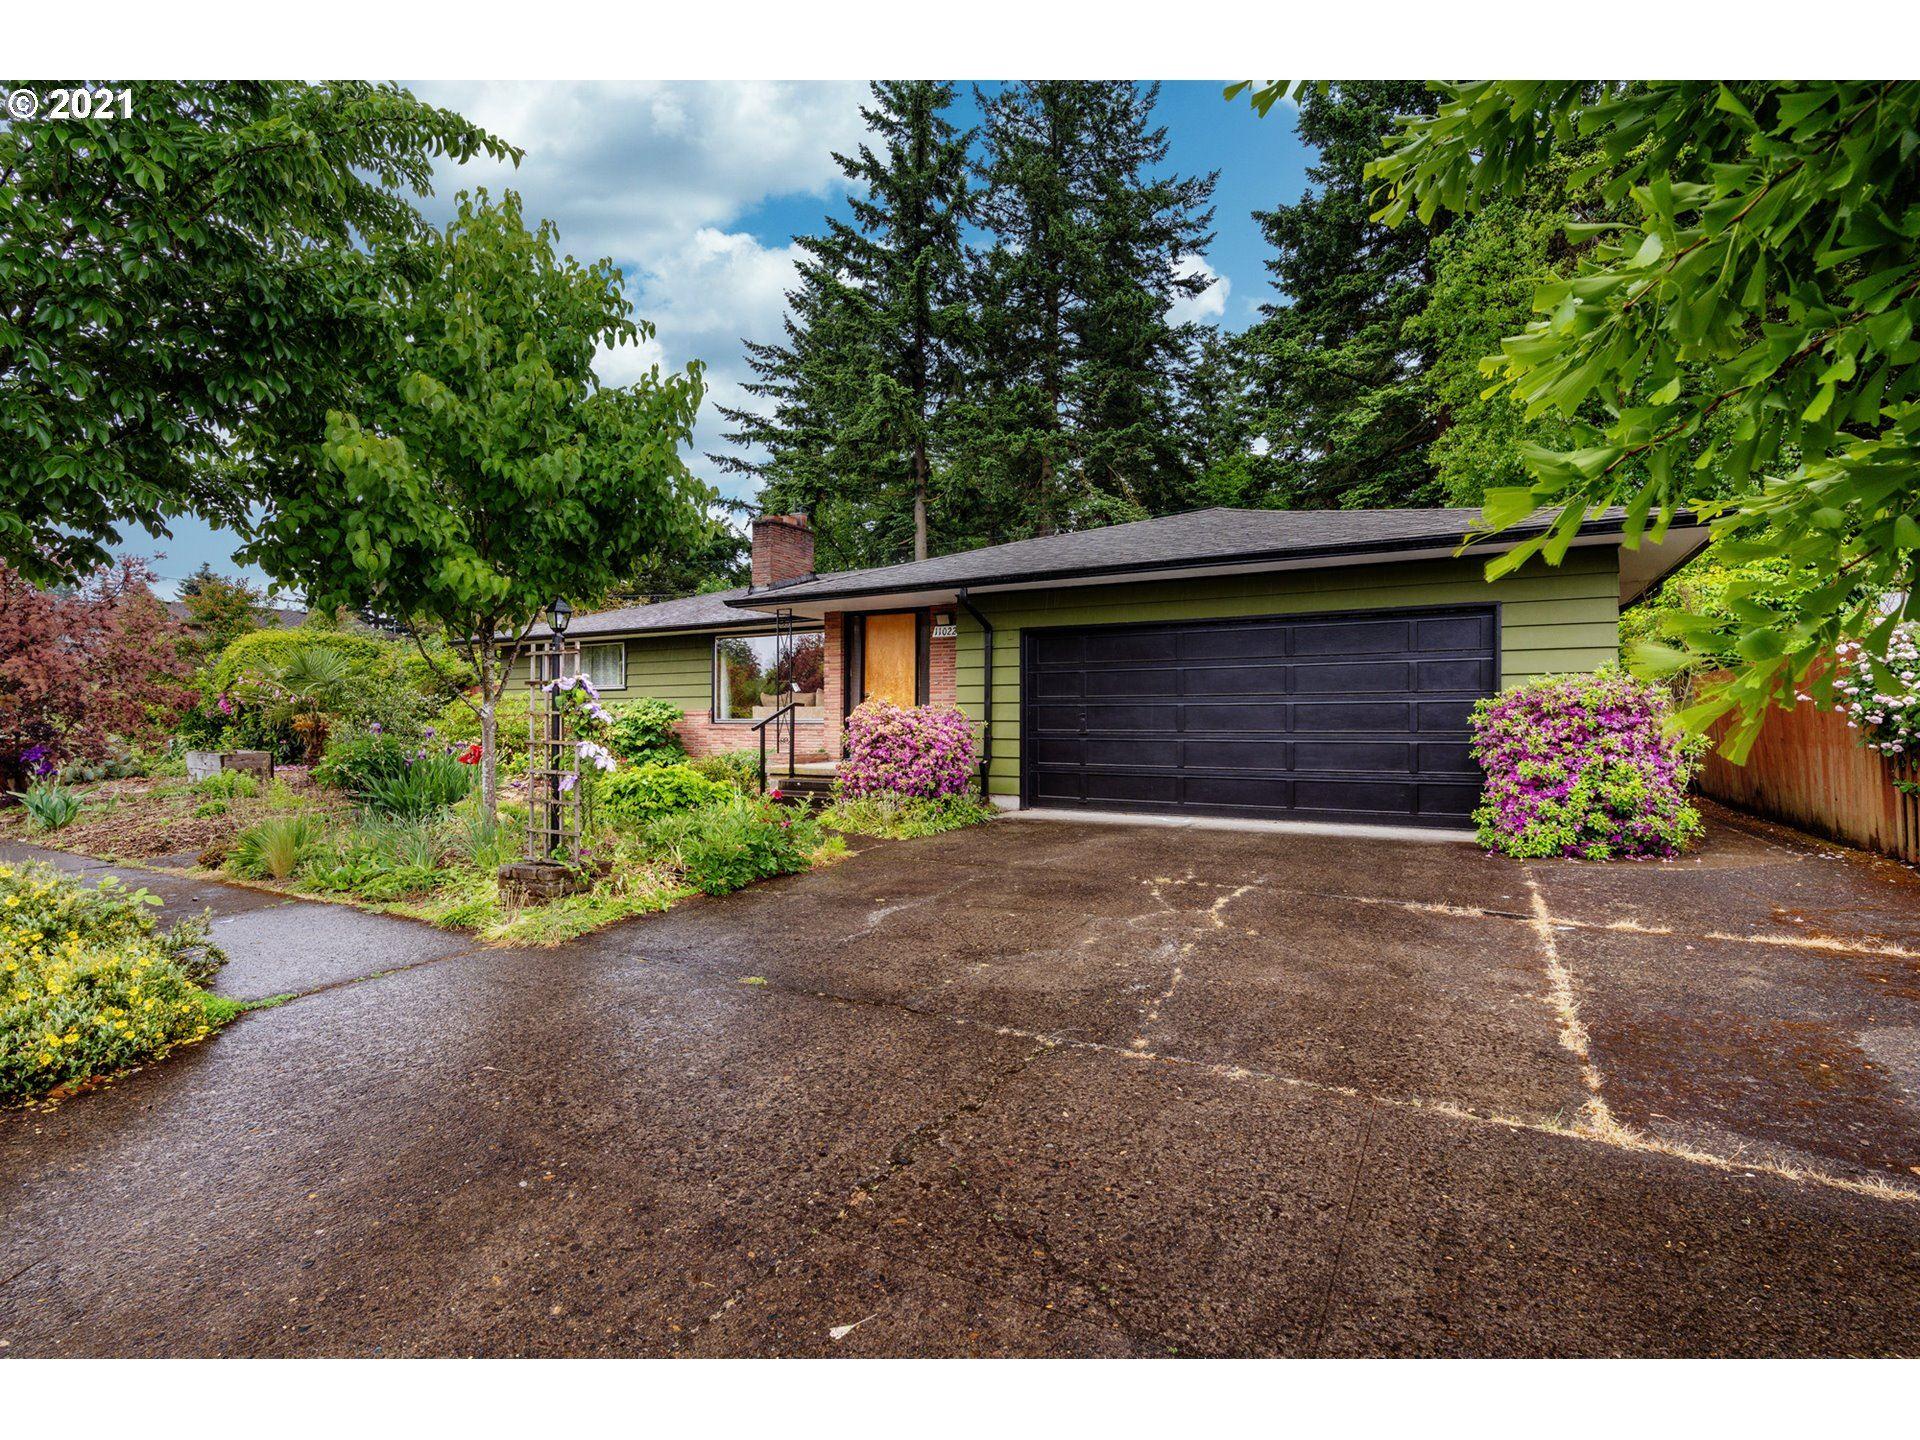 11022 SE STEPHENS ST, Portland, OR 97216 - MLS#: 21501301